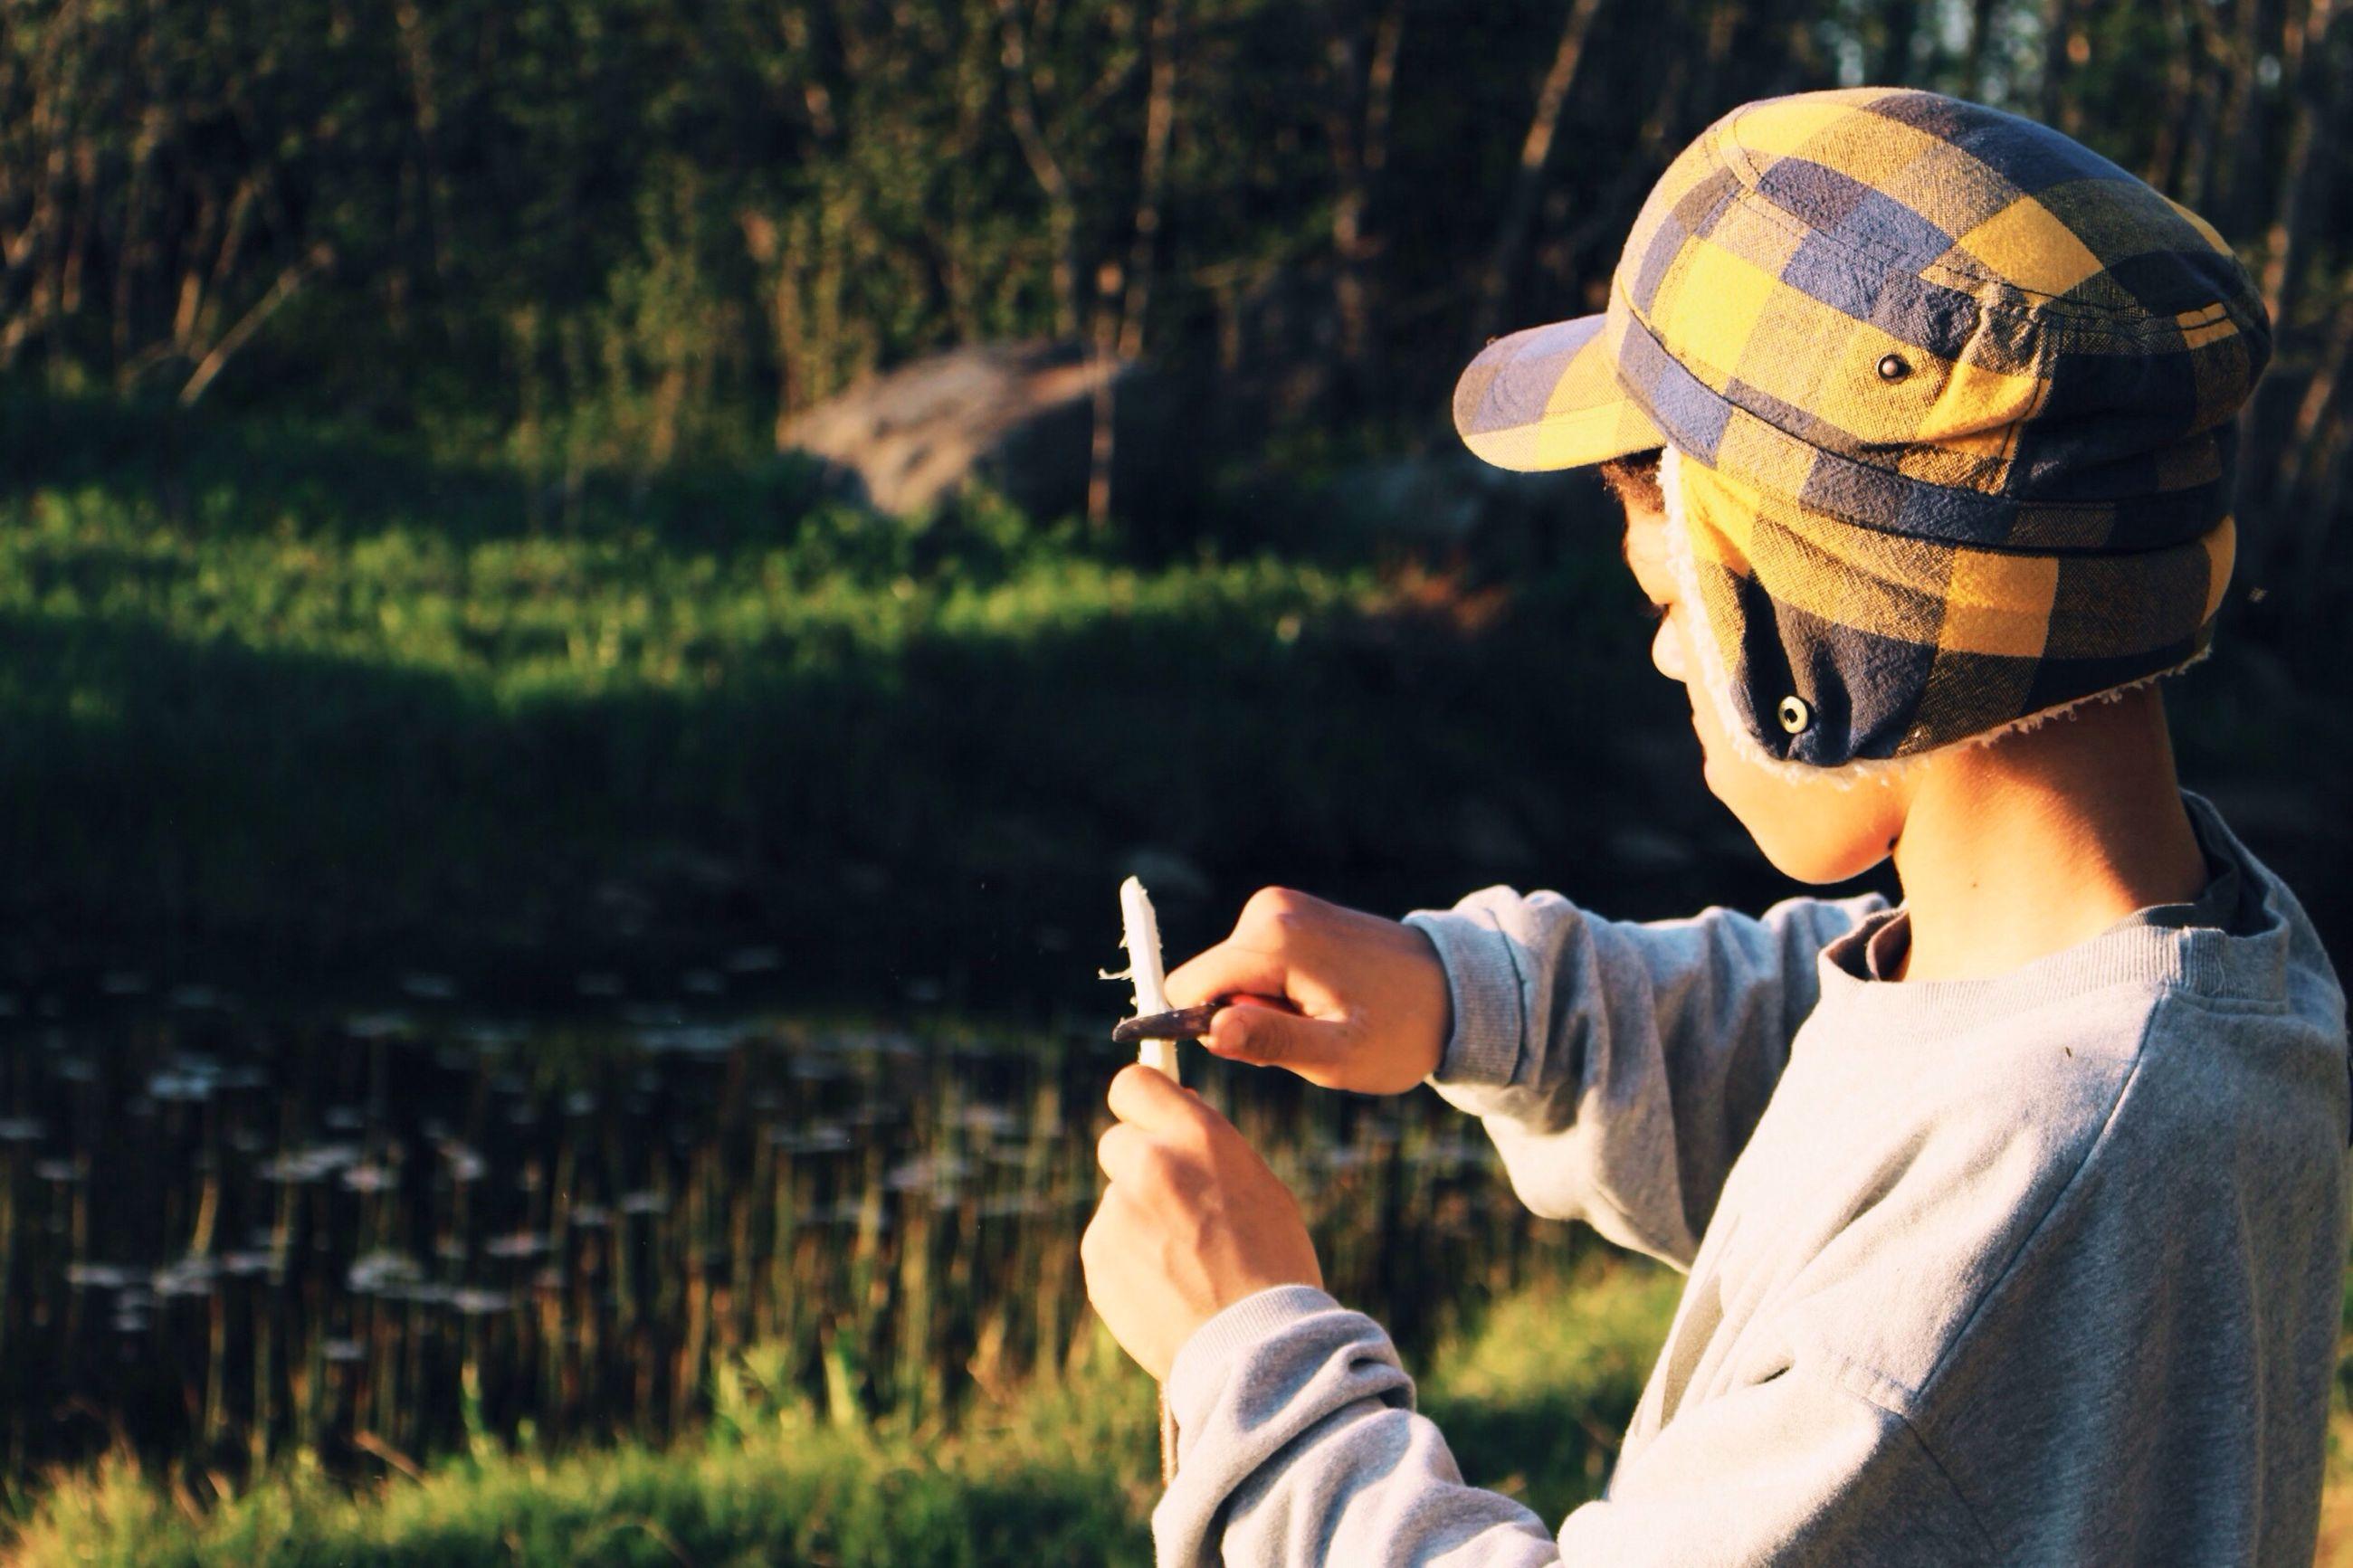 Boy cutting stick outdoors